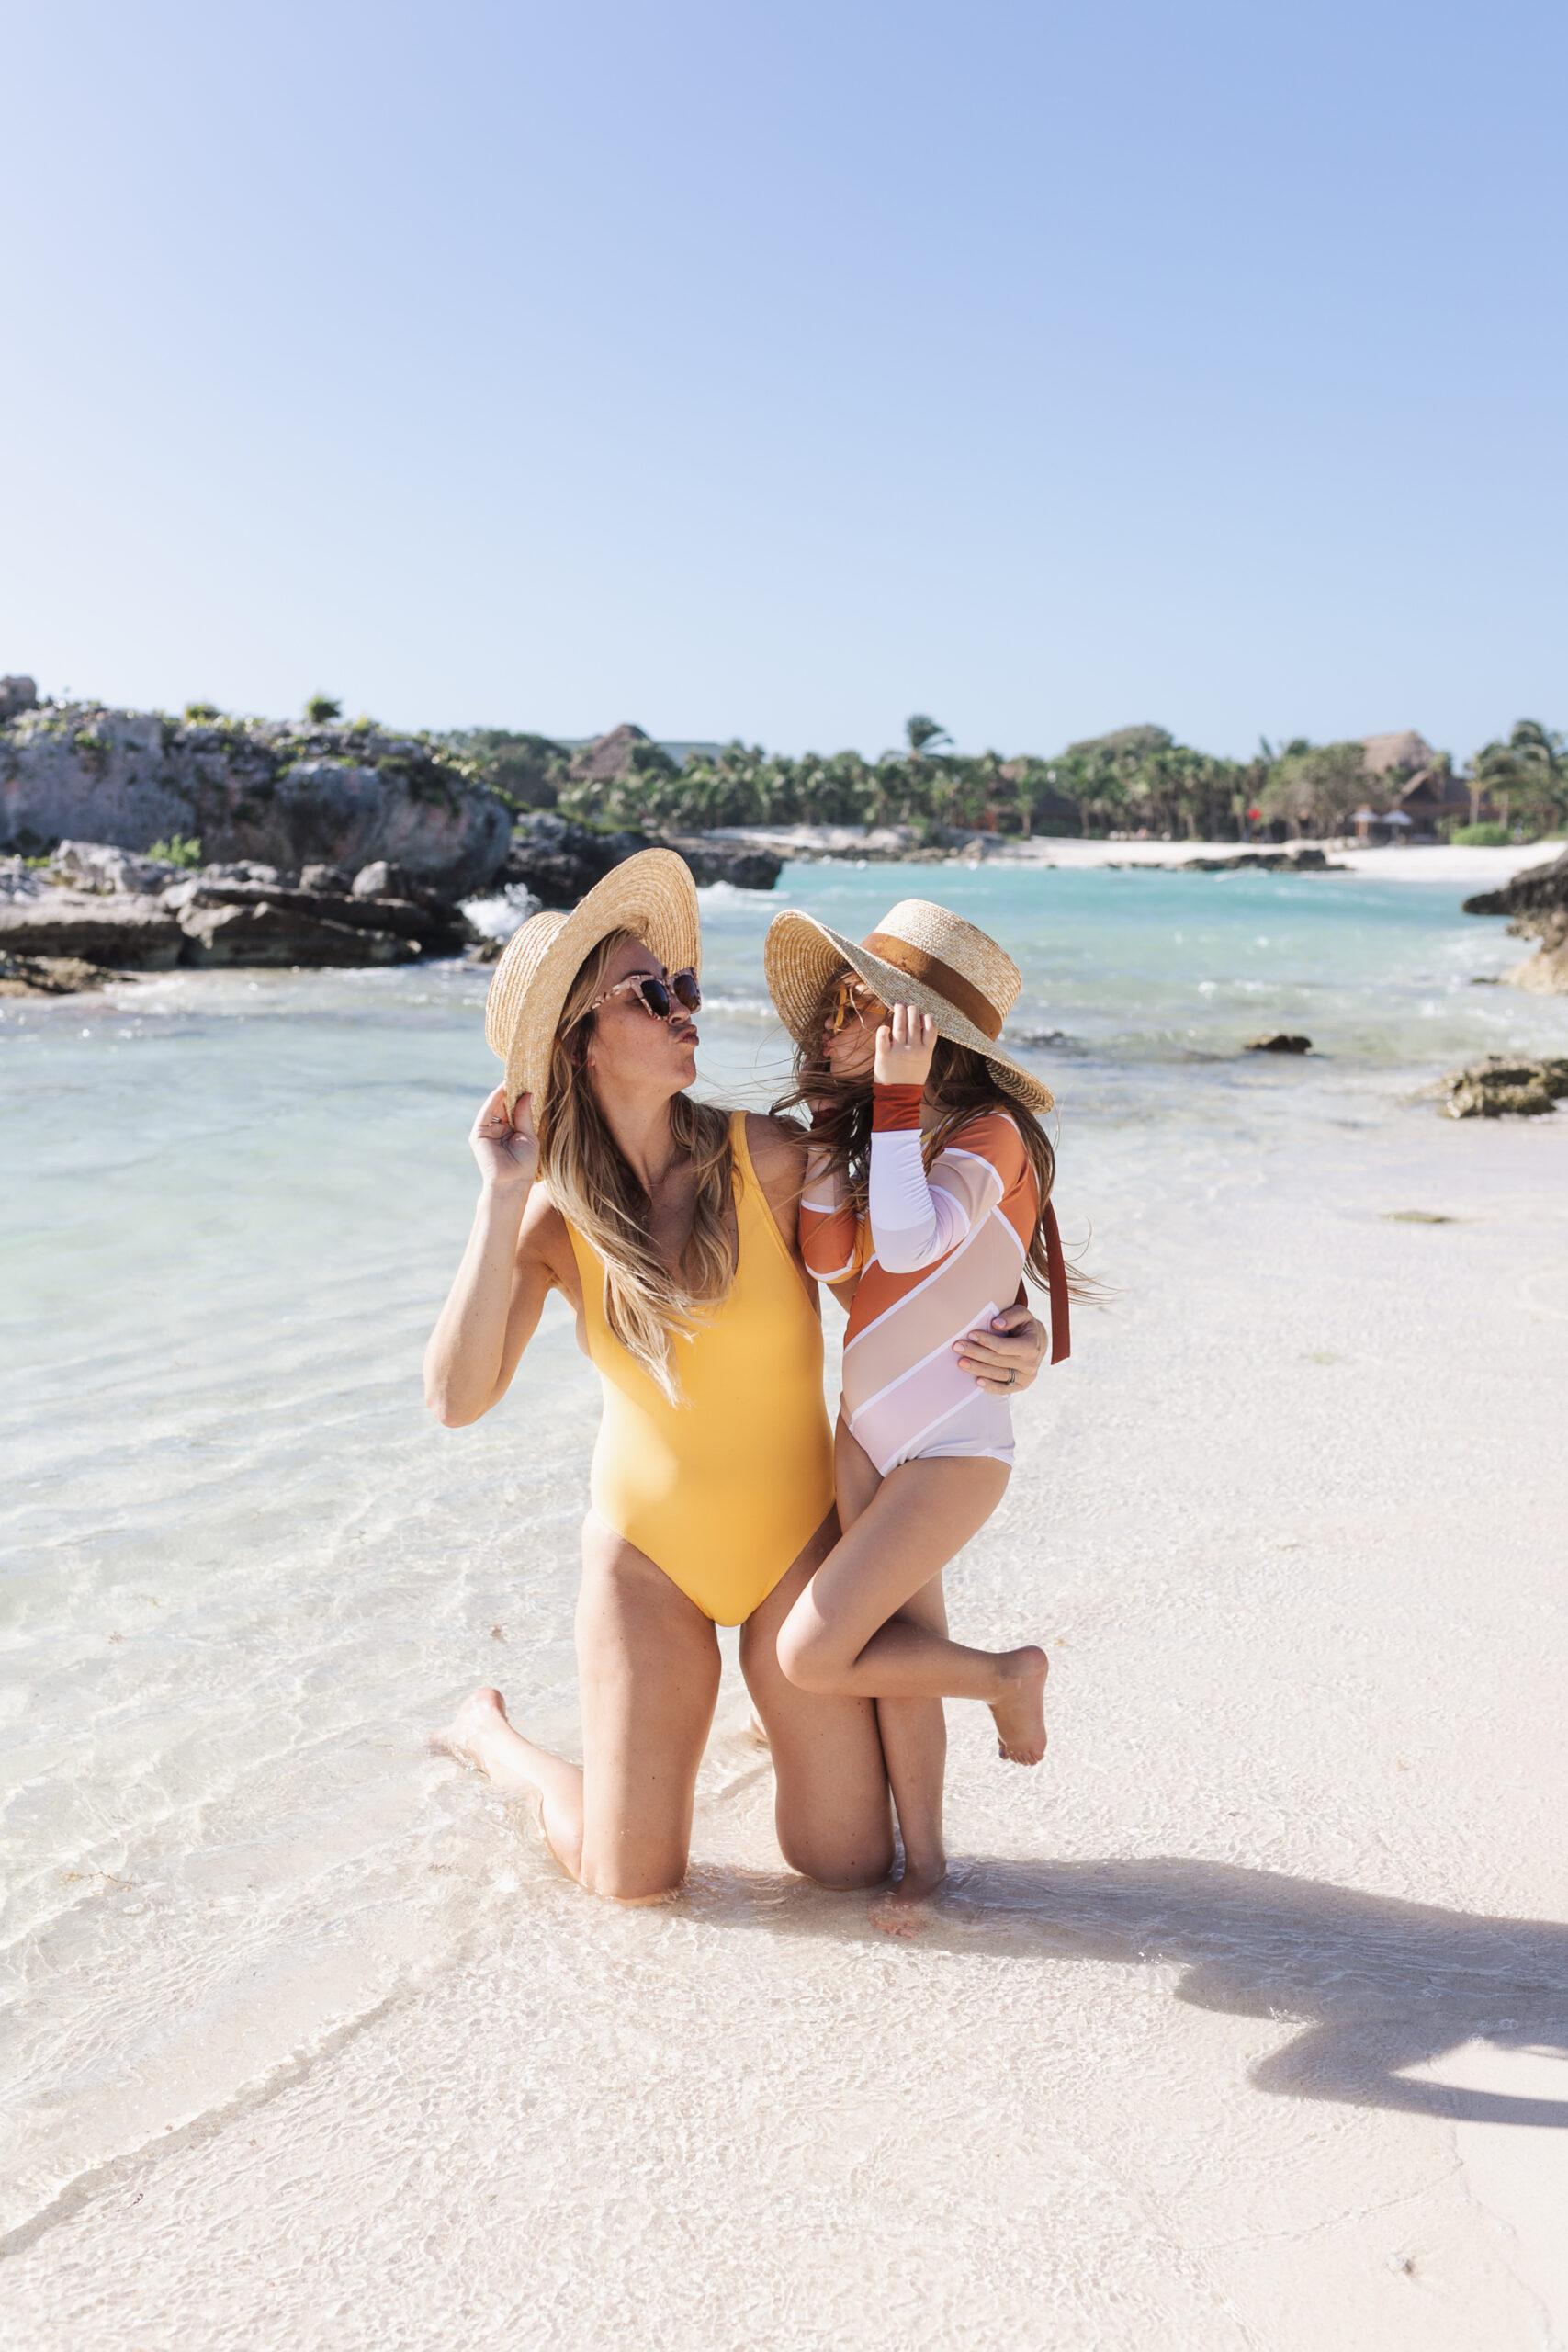 beachside all day every day in the riviera maya! #thelovedesignedlife #theldltravels #beach #mexico #familytravel